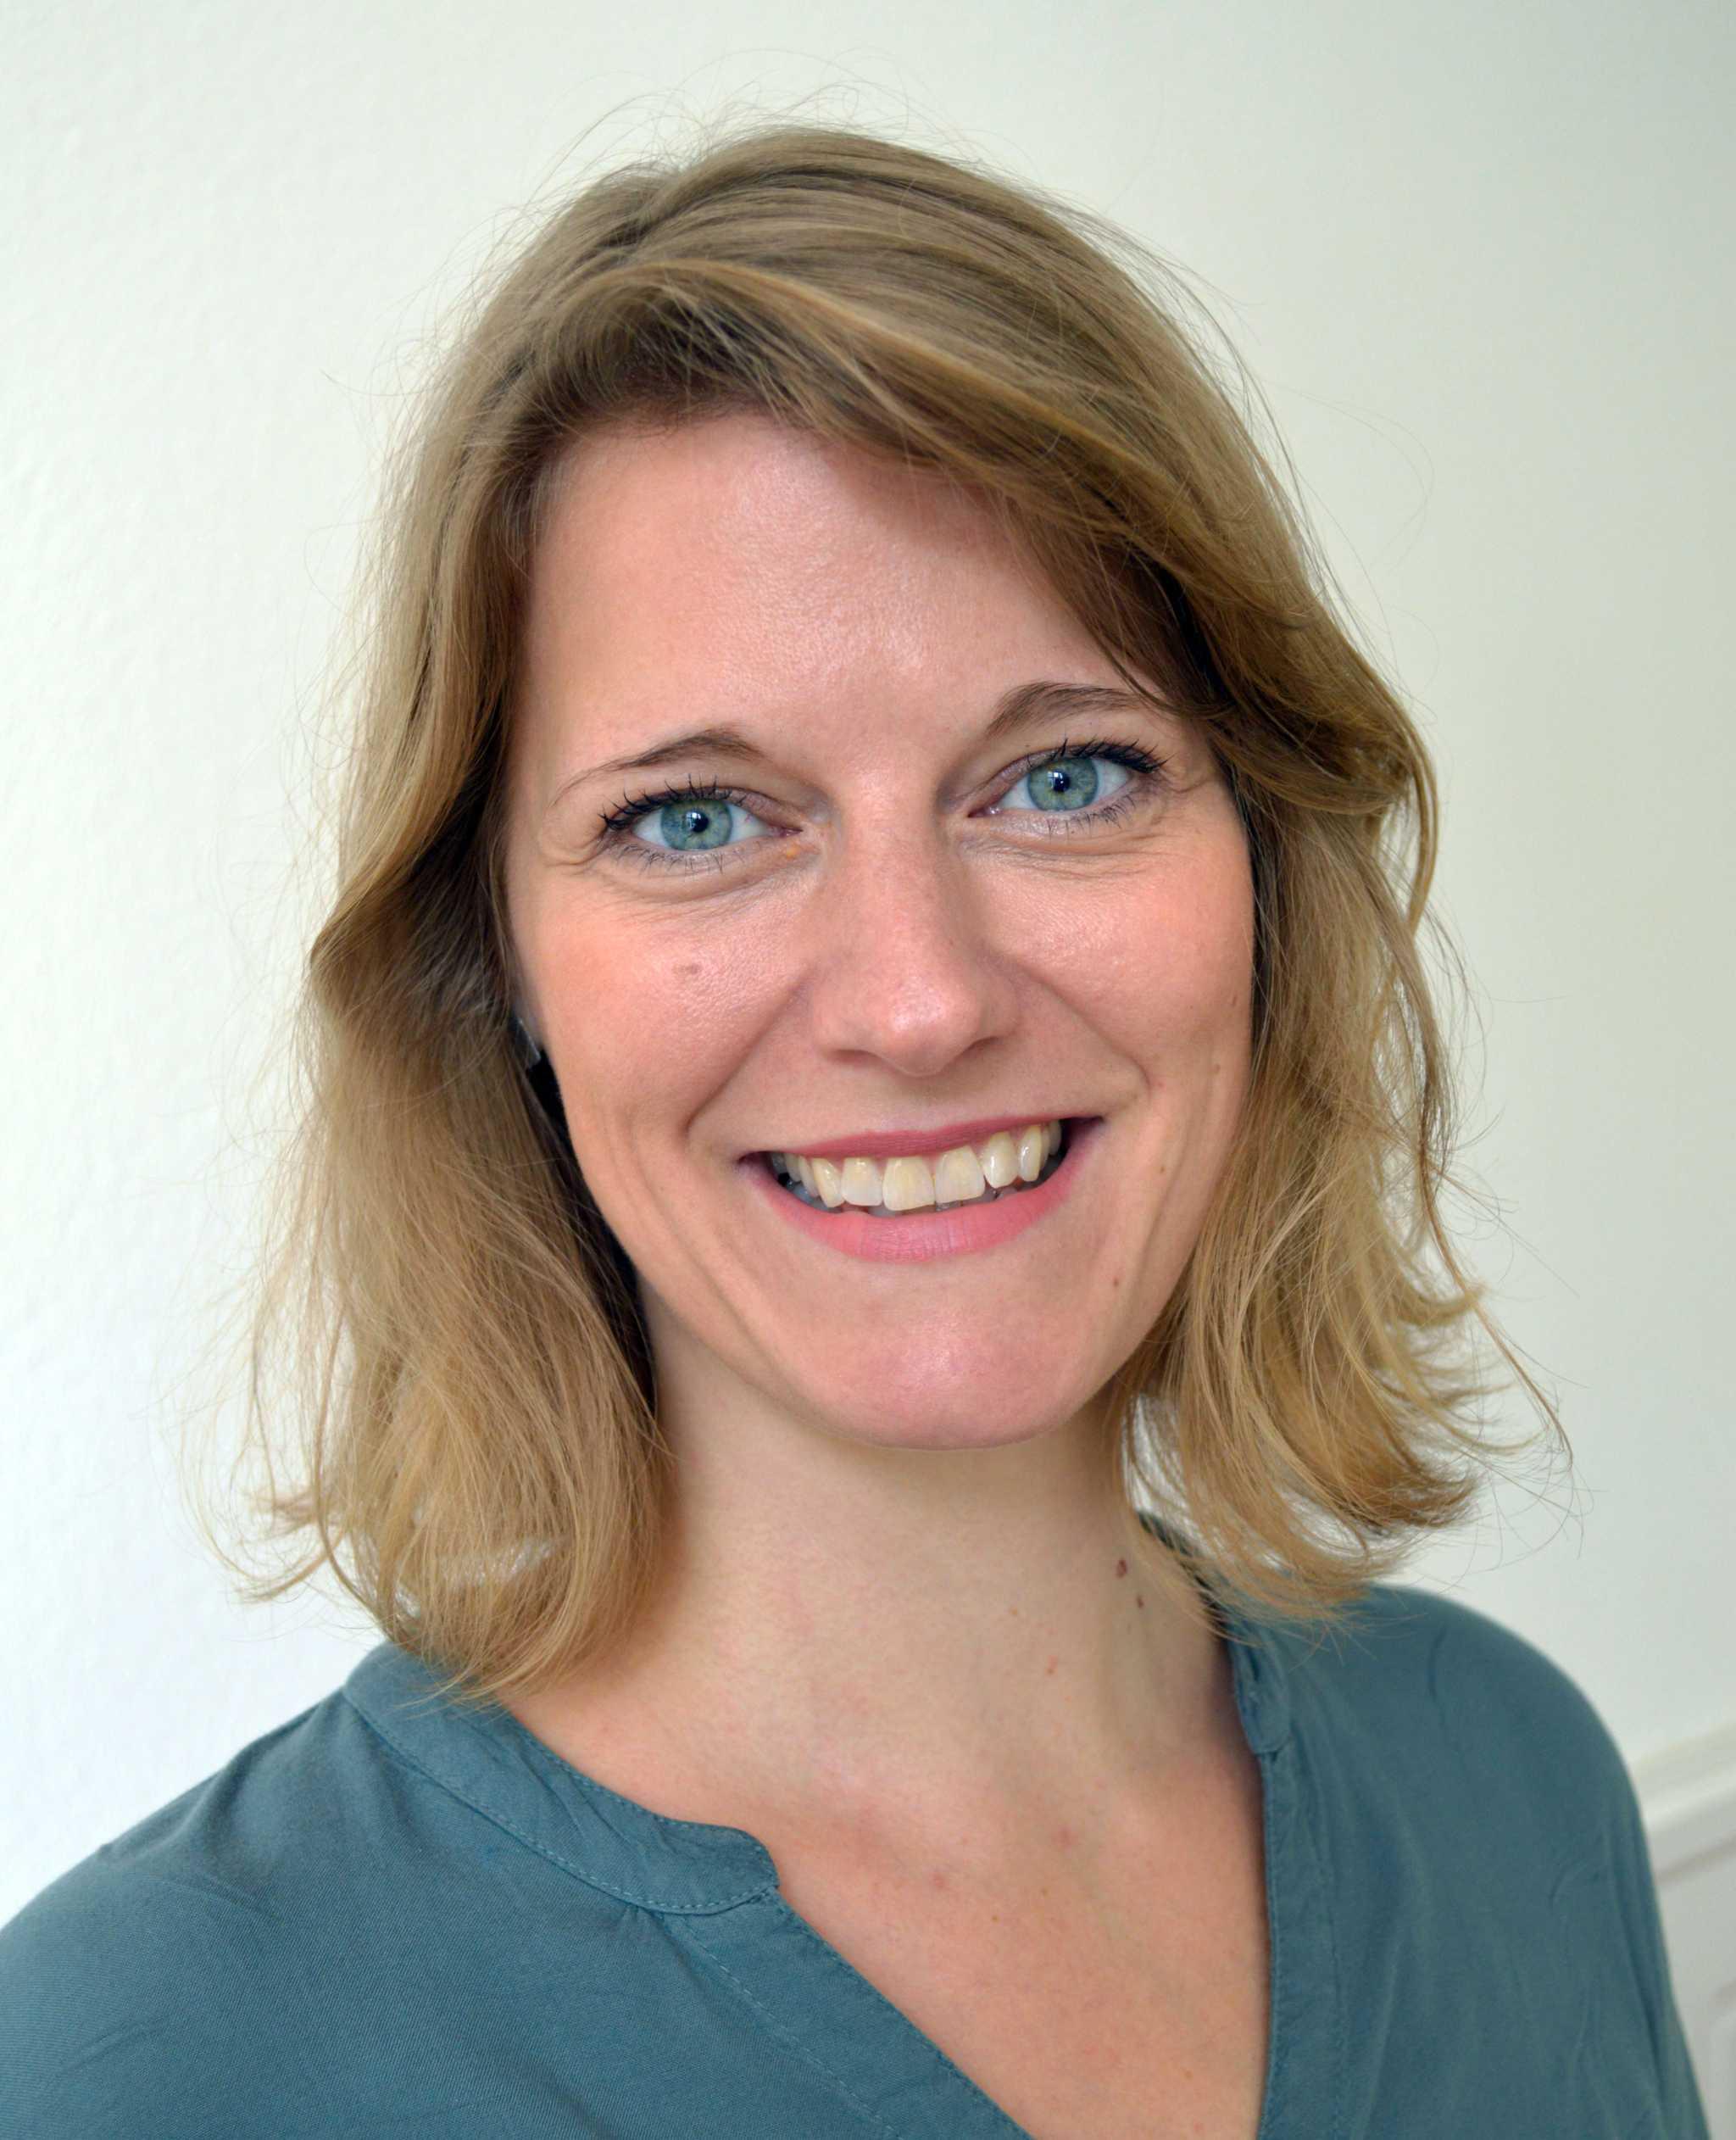 Mareike Vitt